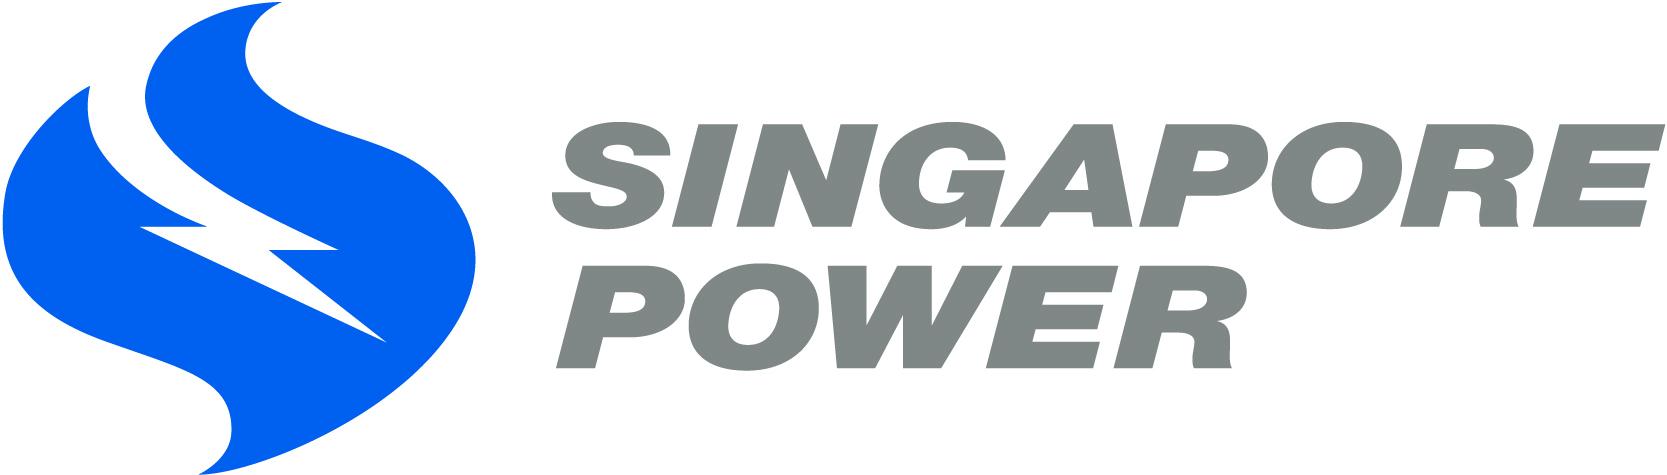 Singapore Power Logo photo - 1